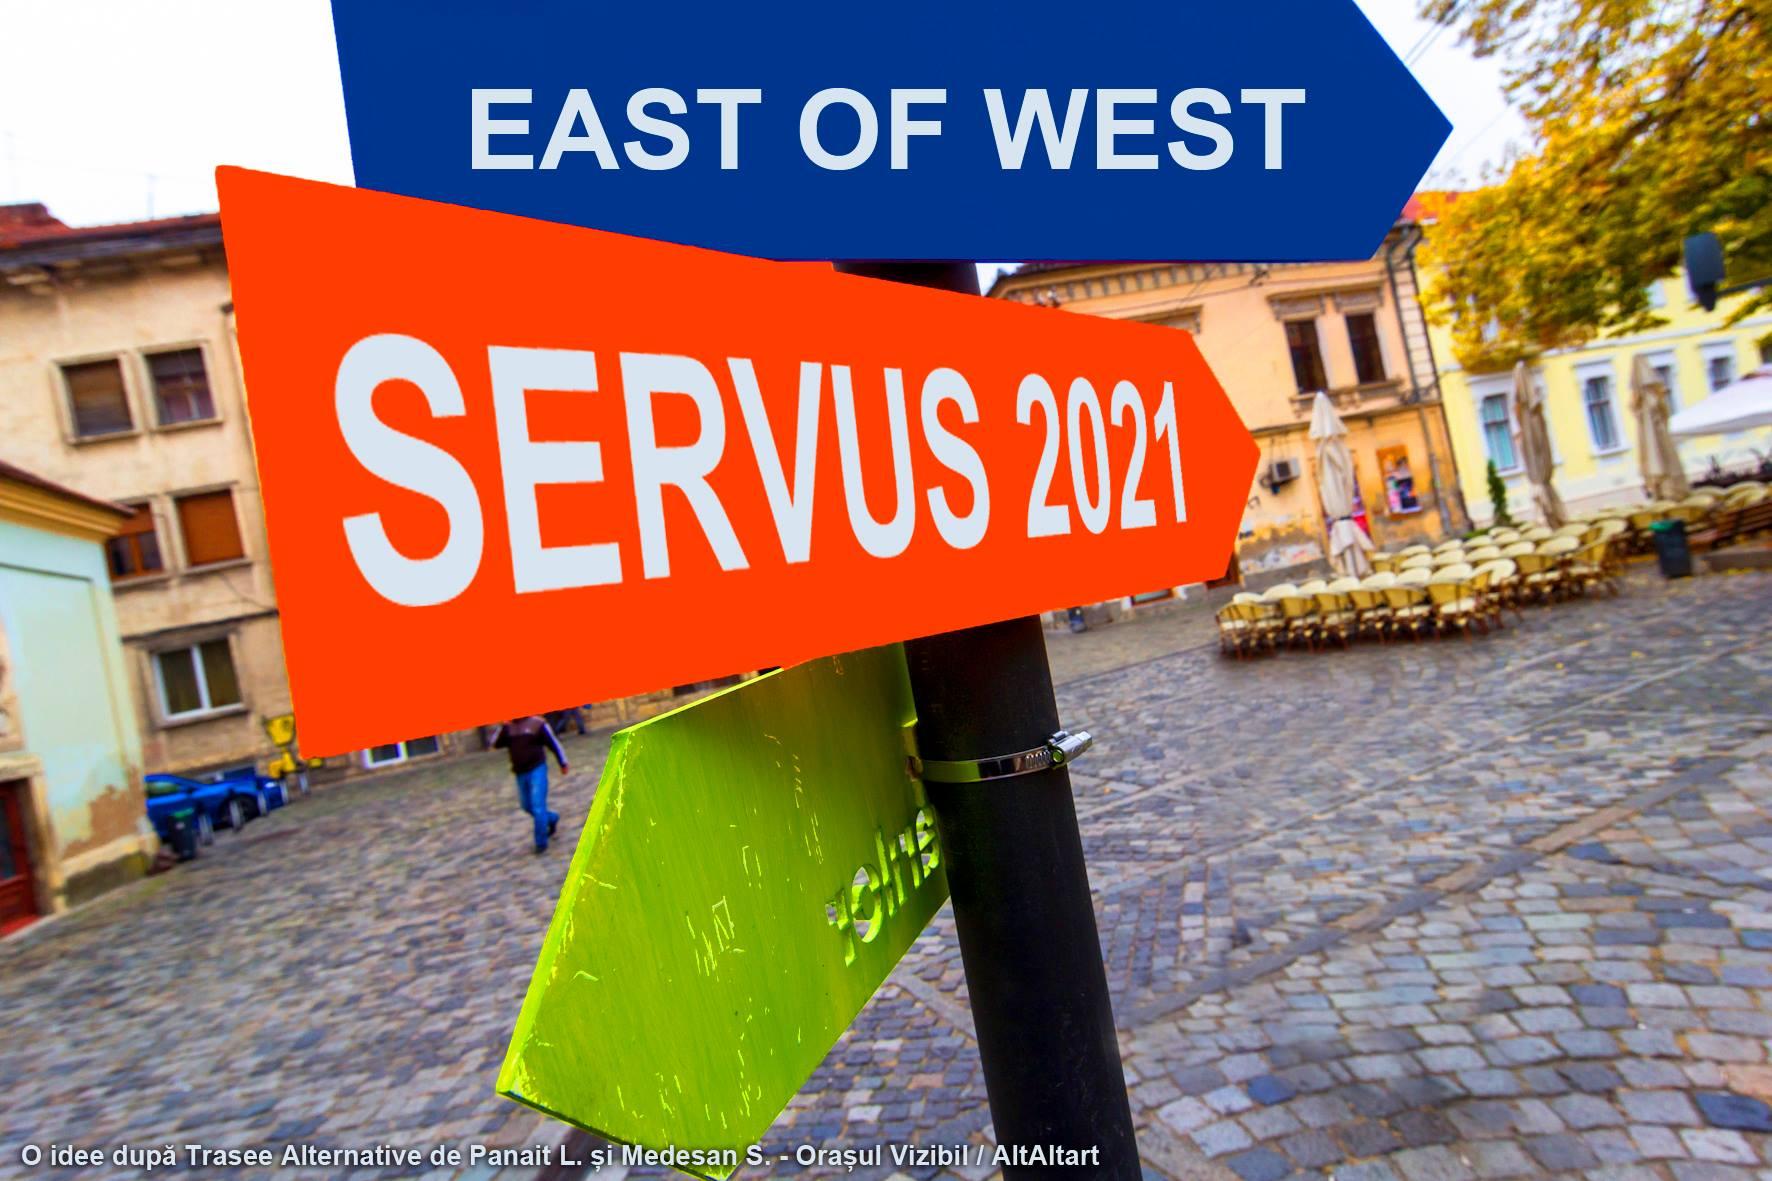 servus 2021 east of west